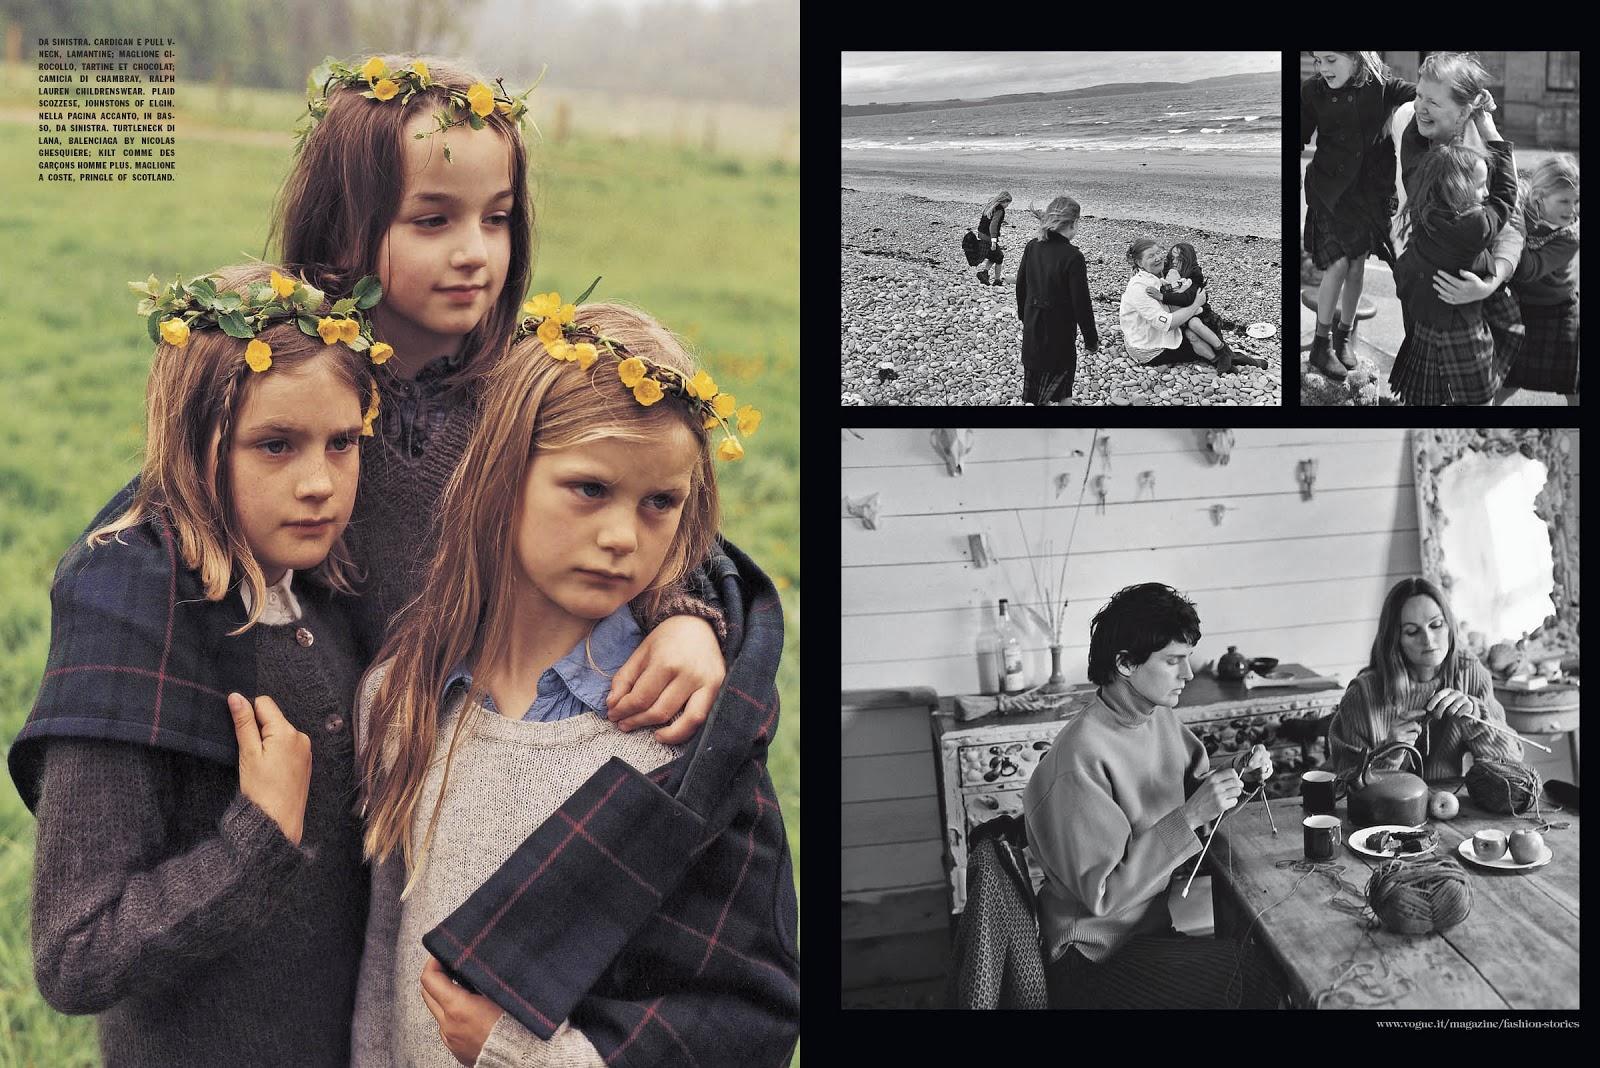 Stella Tennant by Bruce Weber (A Highland Friendship - Vogue Italia October 2012) 7